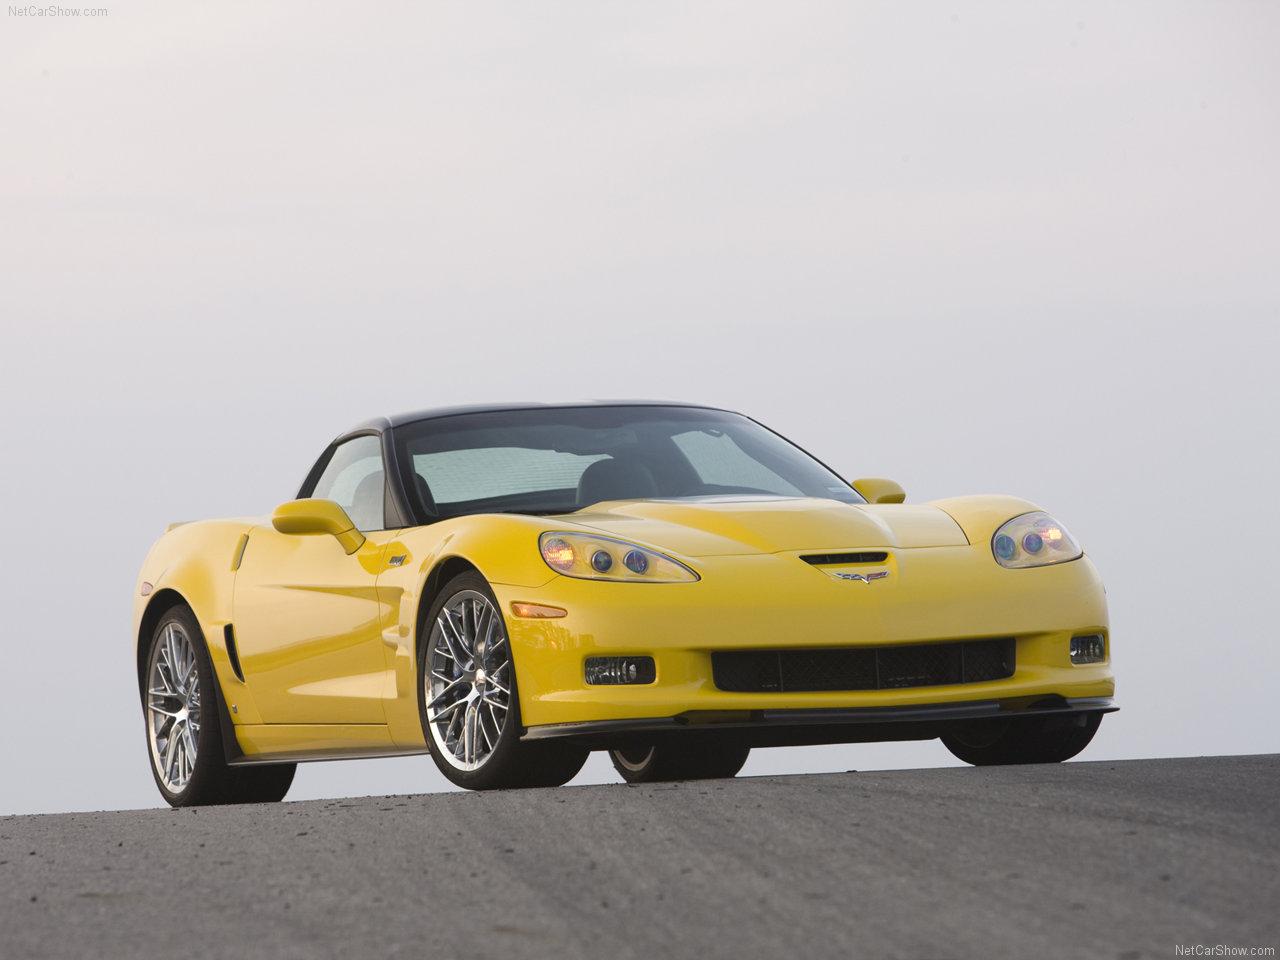 http://2.bp.blogspot.com/-P_nI_irMdfY/TW9uHyzZ5hI/AAAAAAAALnA/8fsKENoGKvE/s1600/Chevrolet-Corvette_ZR1_2009_1280x960_wallpaper_02.jpg